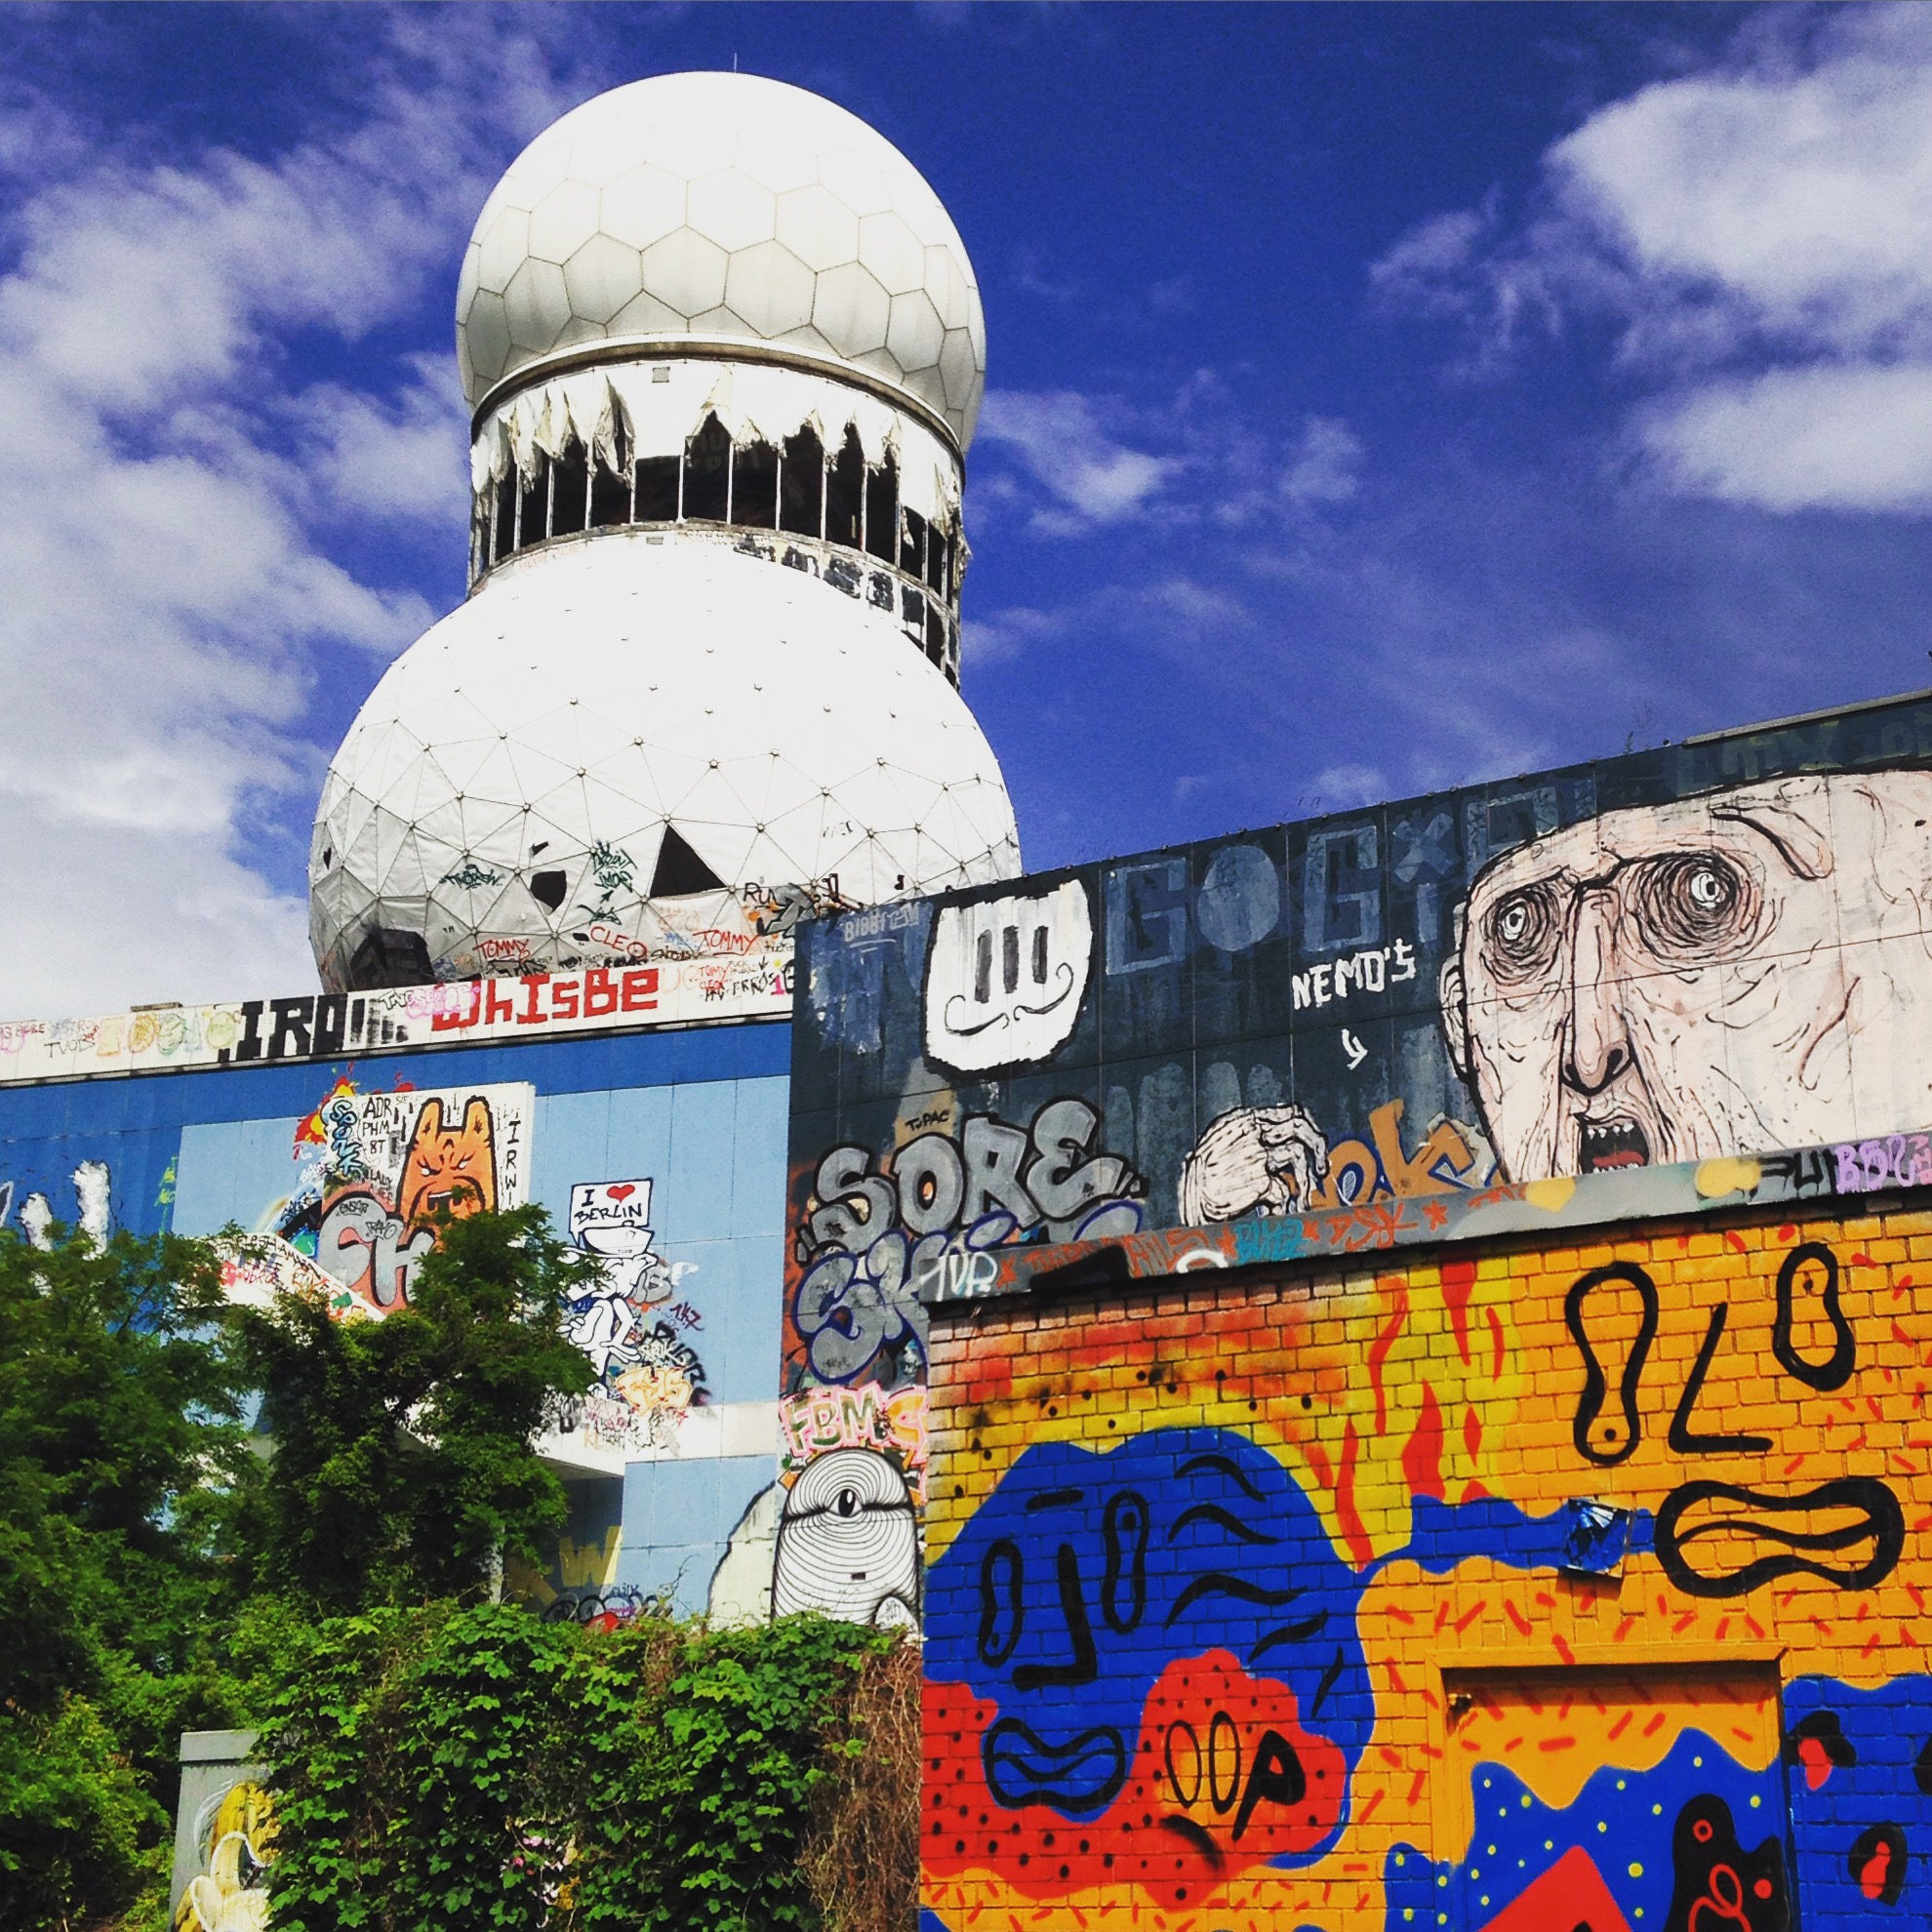 Abandoned US spy base, Berlin